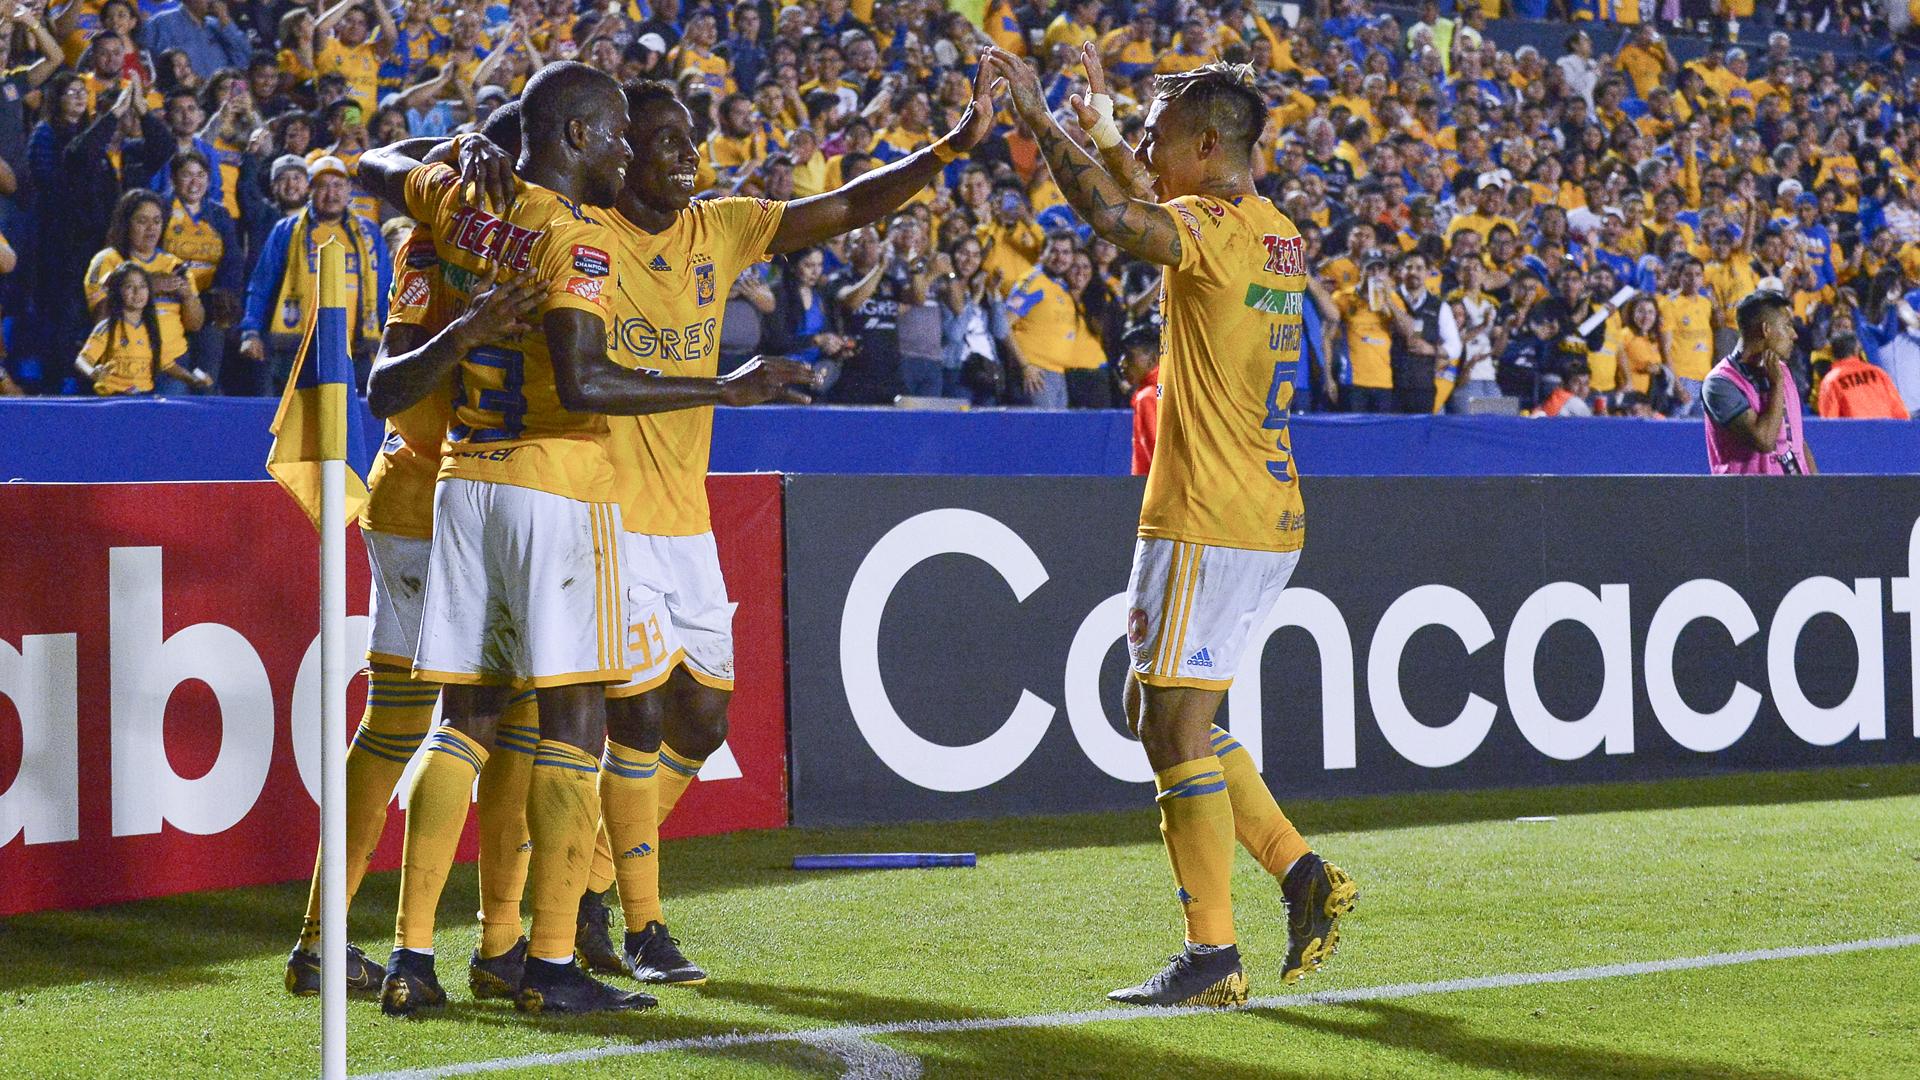 Tigres UANL 3 Santos Laguna 0: Valencia nets brace in semi-final first leg